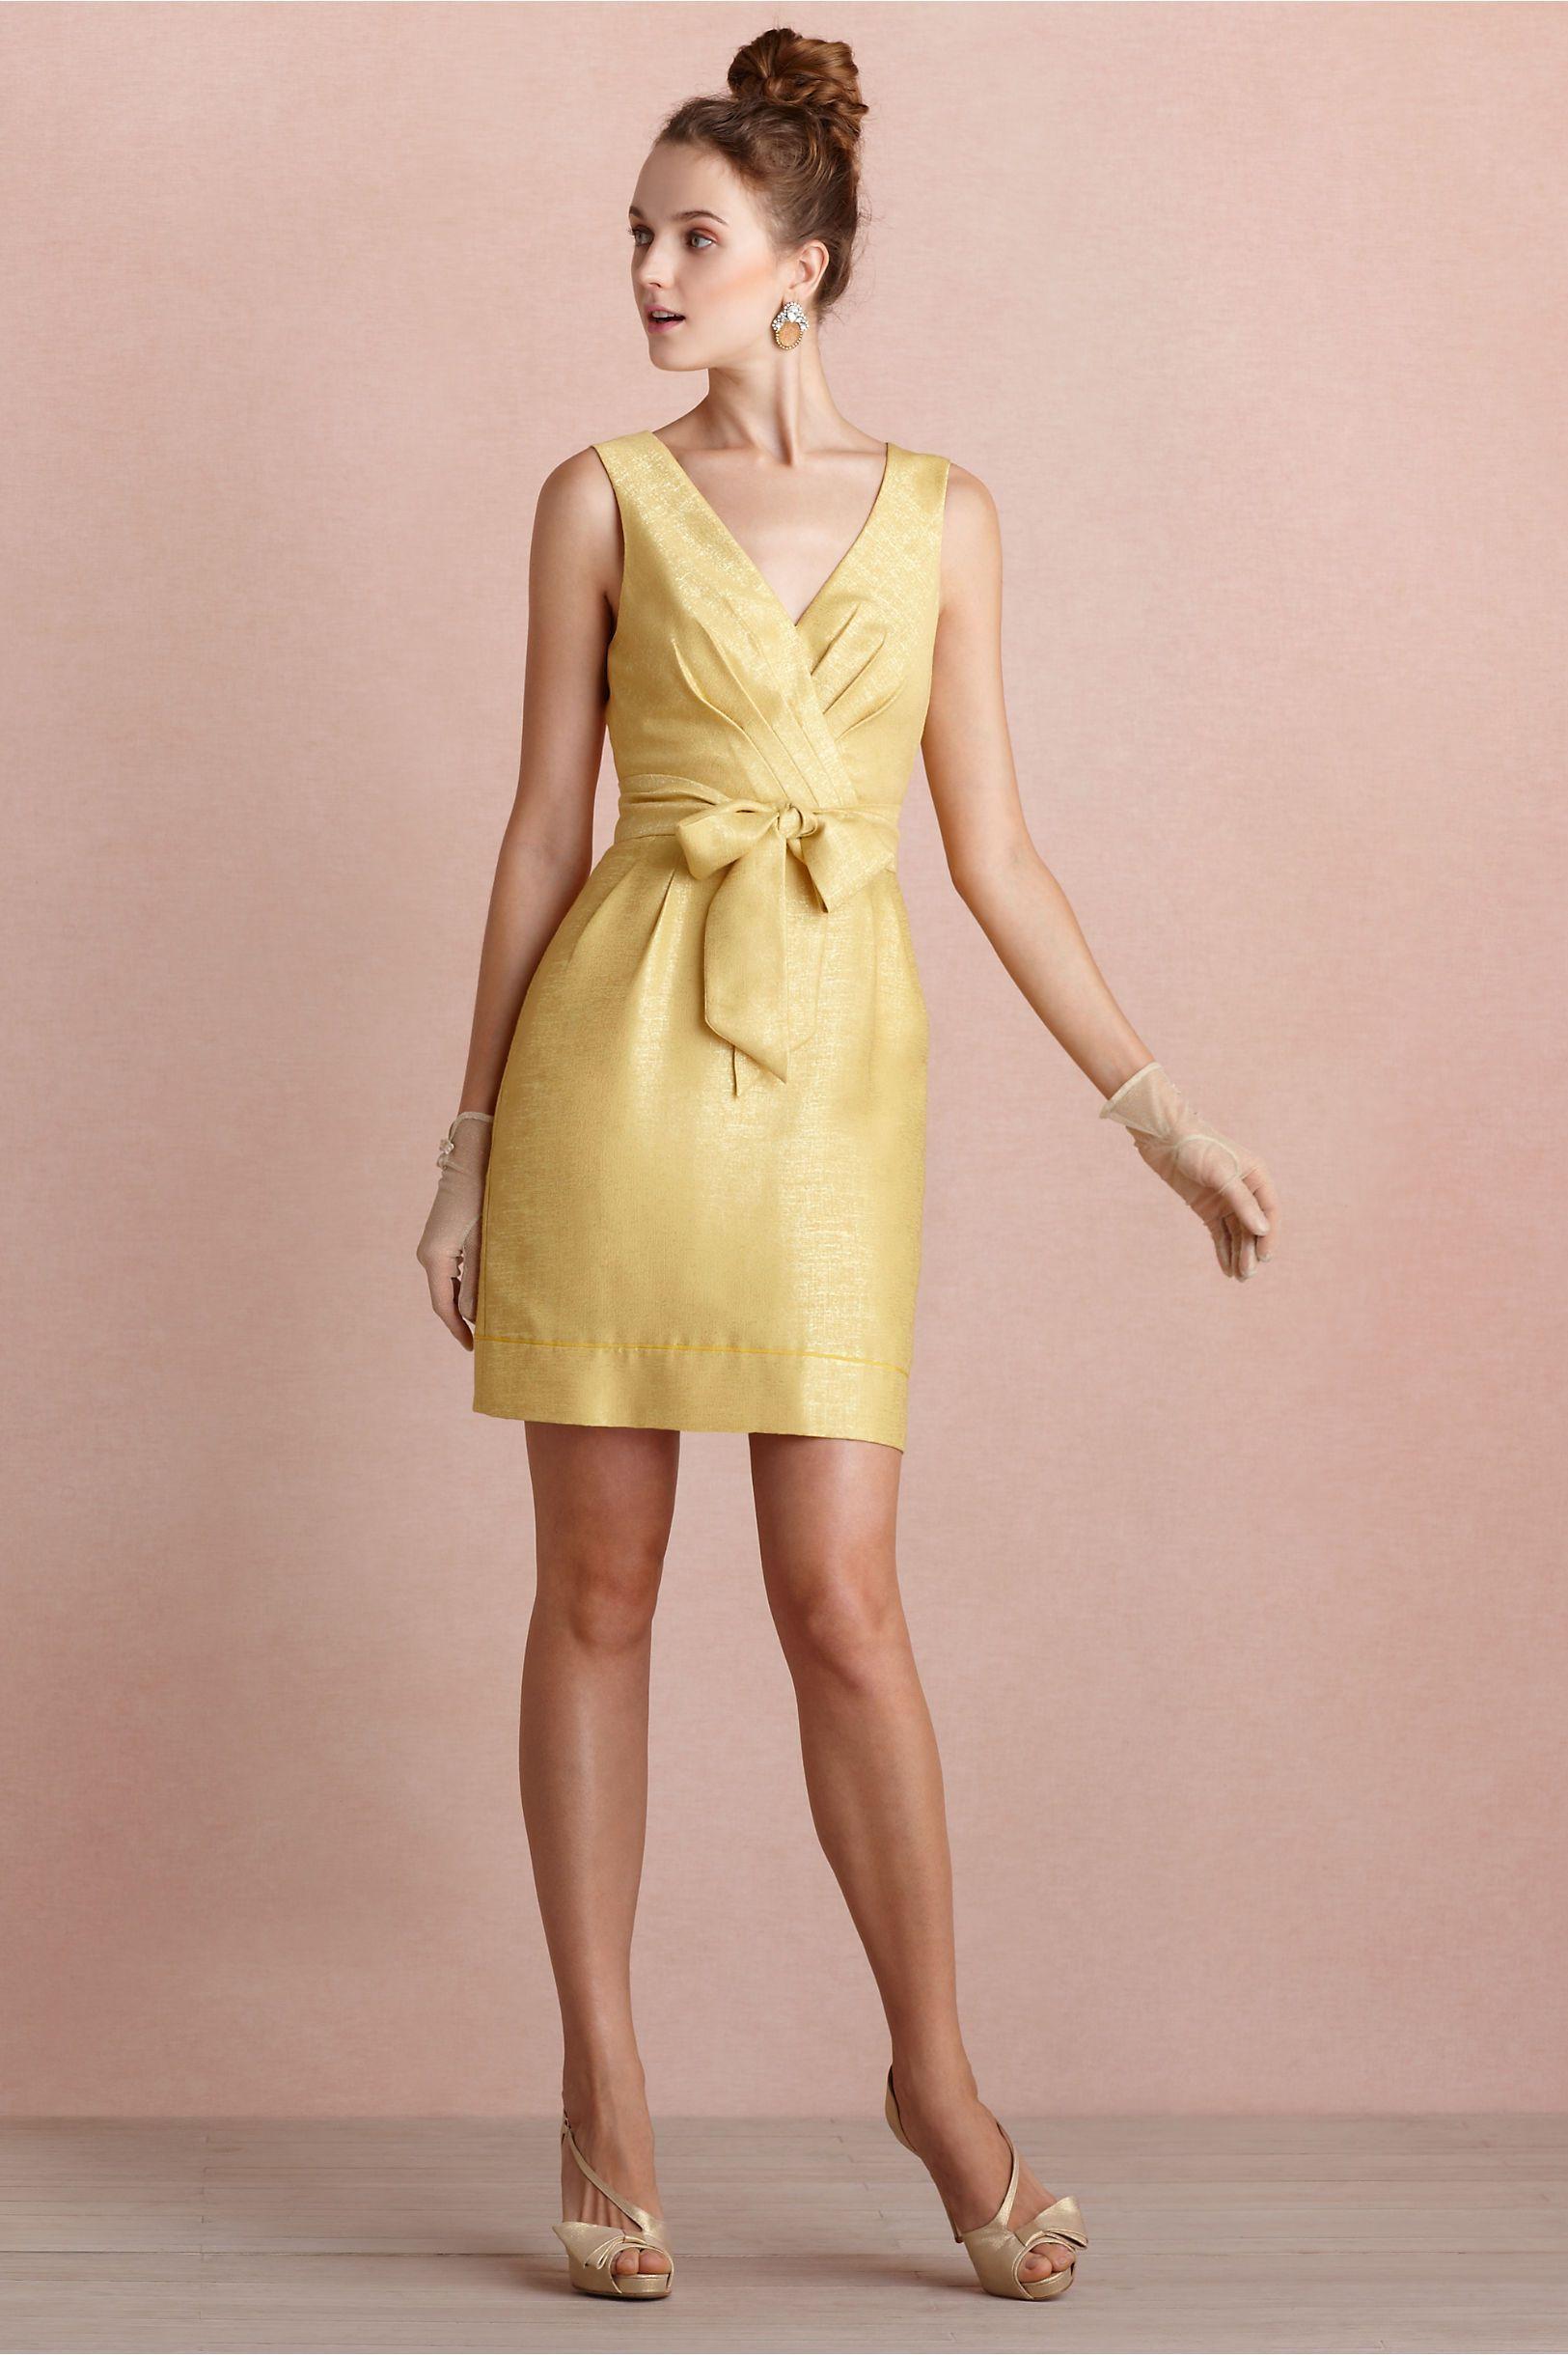 Fénelon dress in shop bridesmaids u partygoers dresses at bhldn i